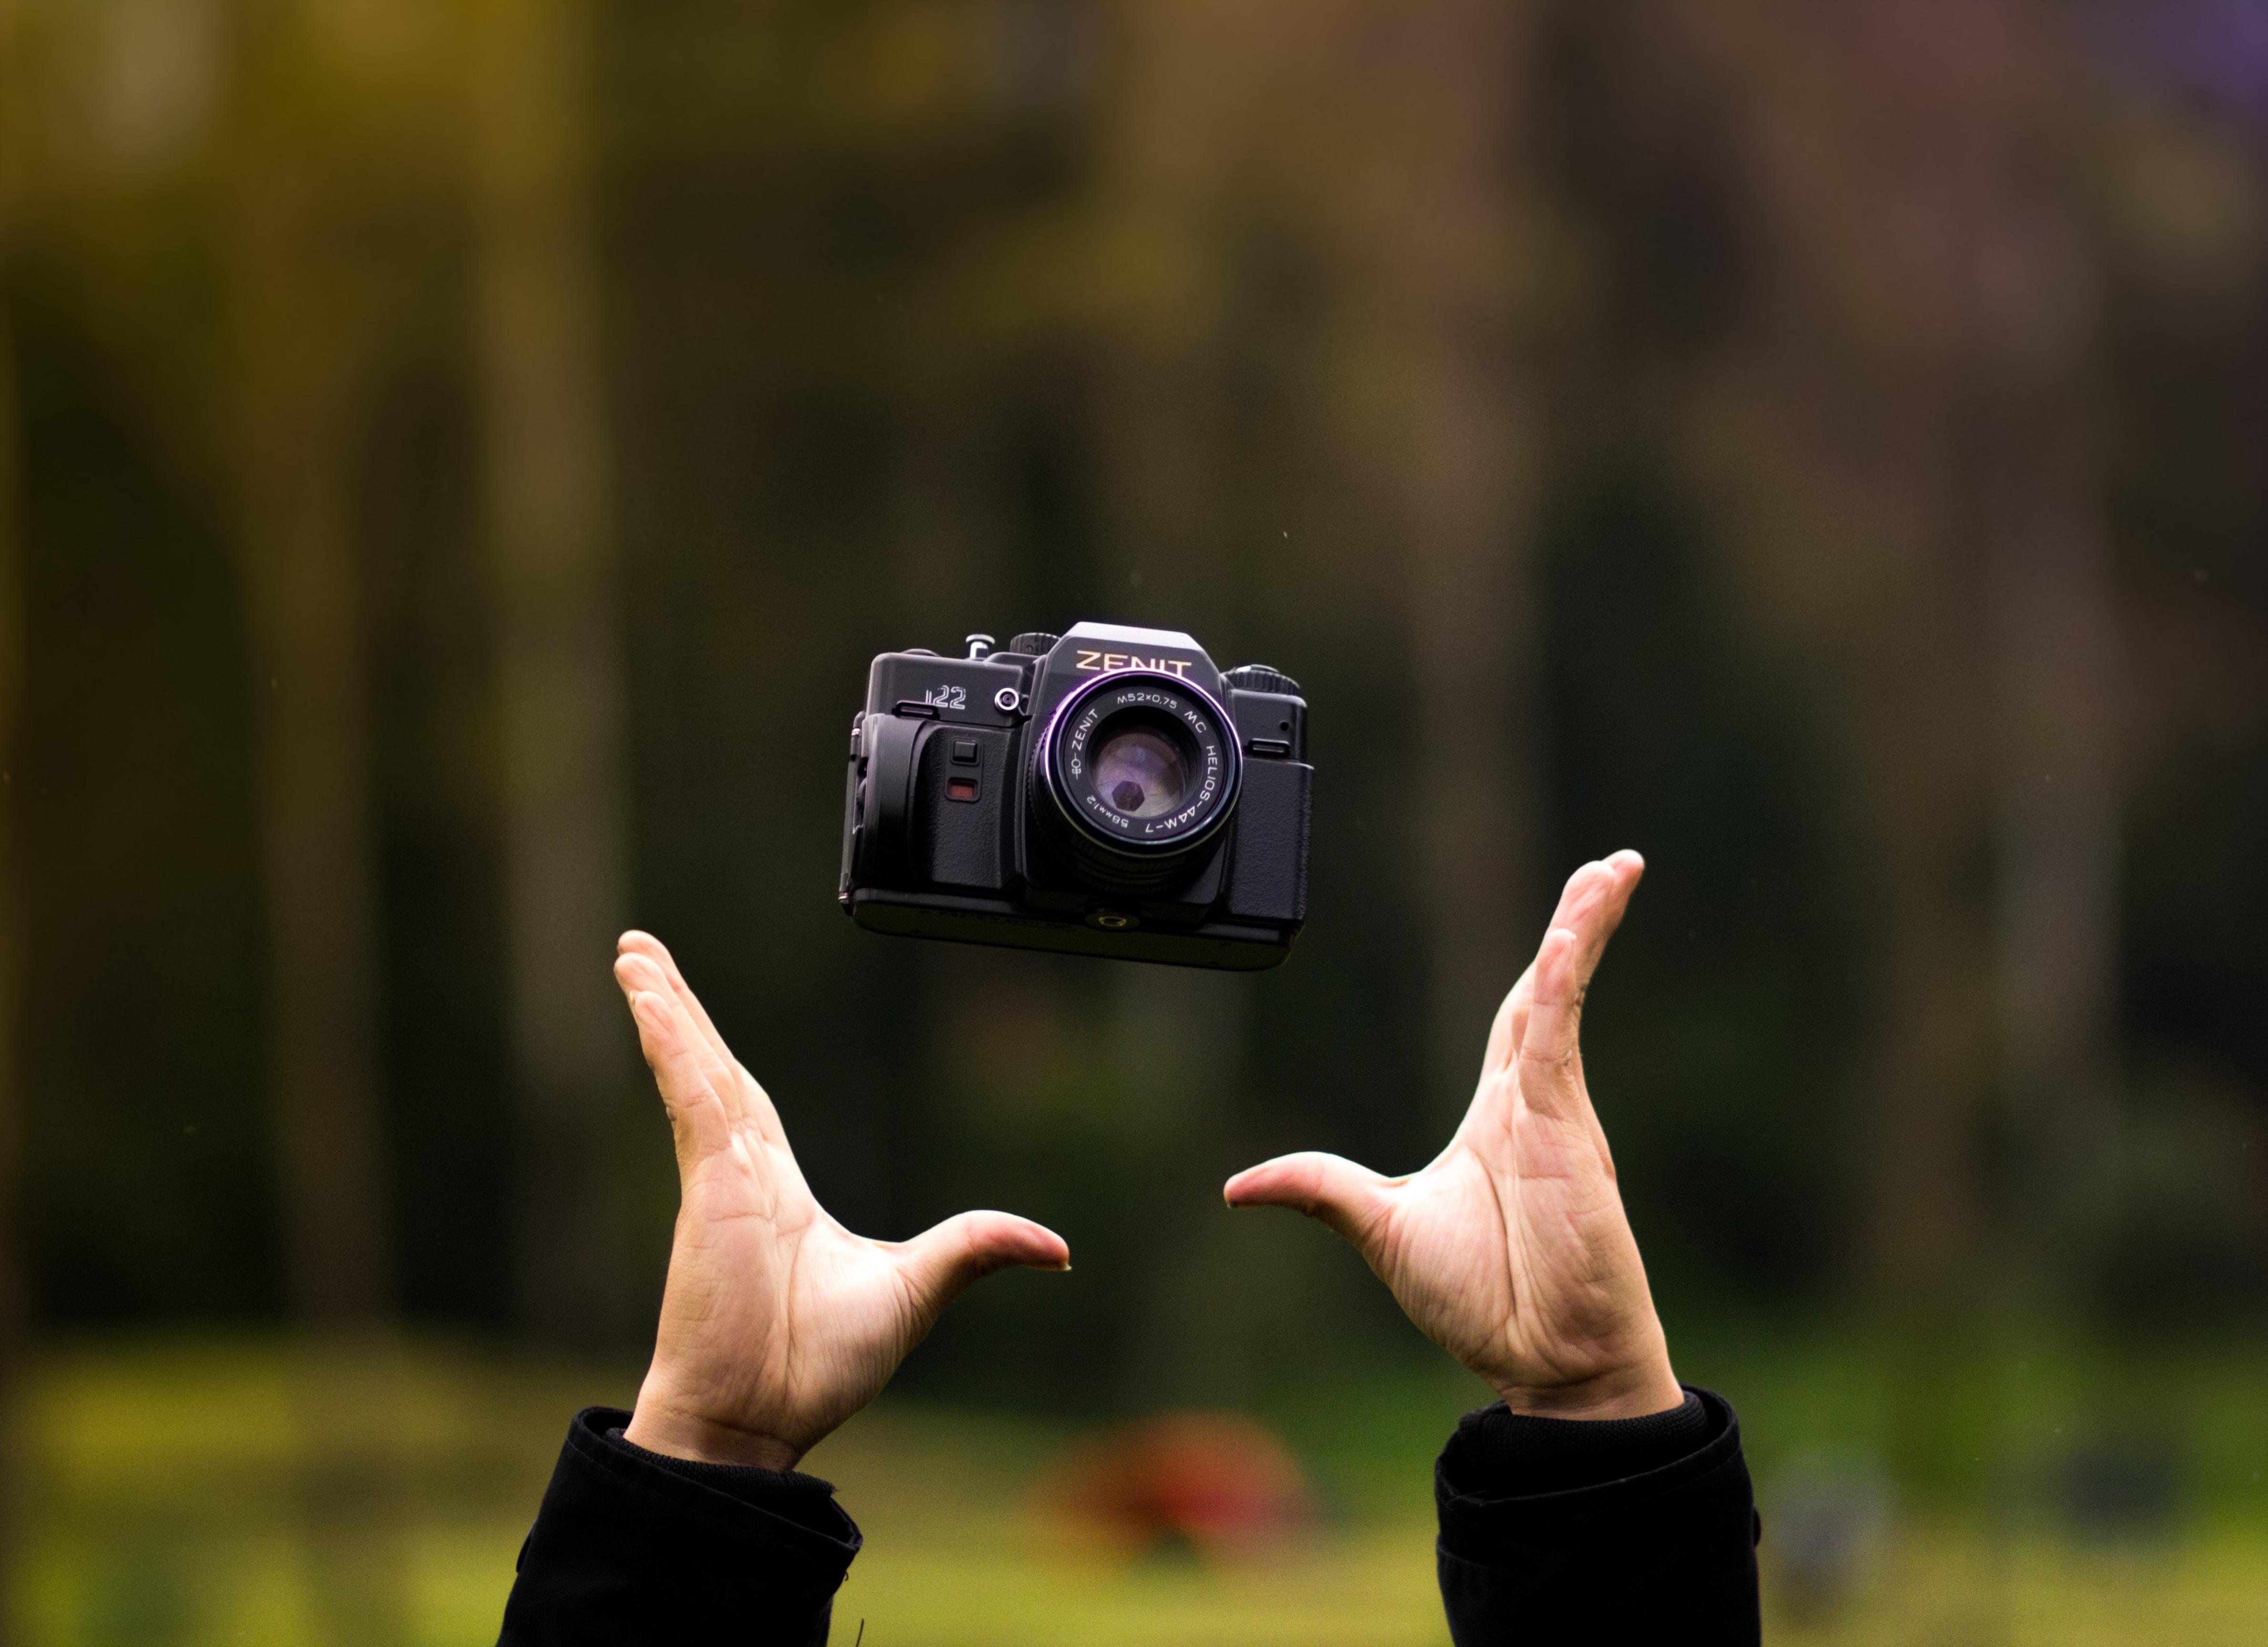 selective focus photography of person trowing black bridge camera